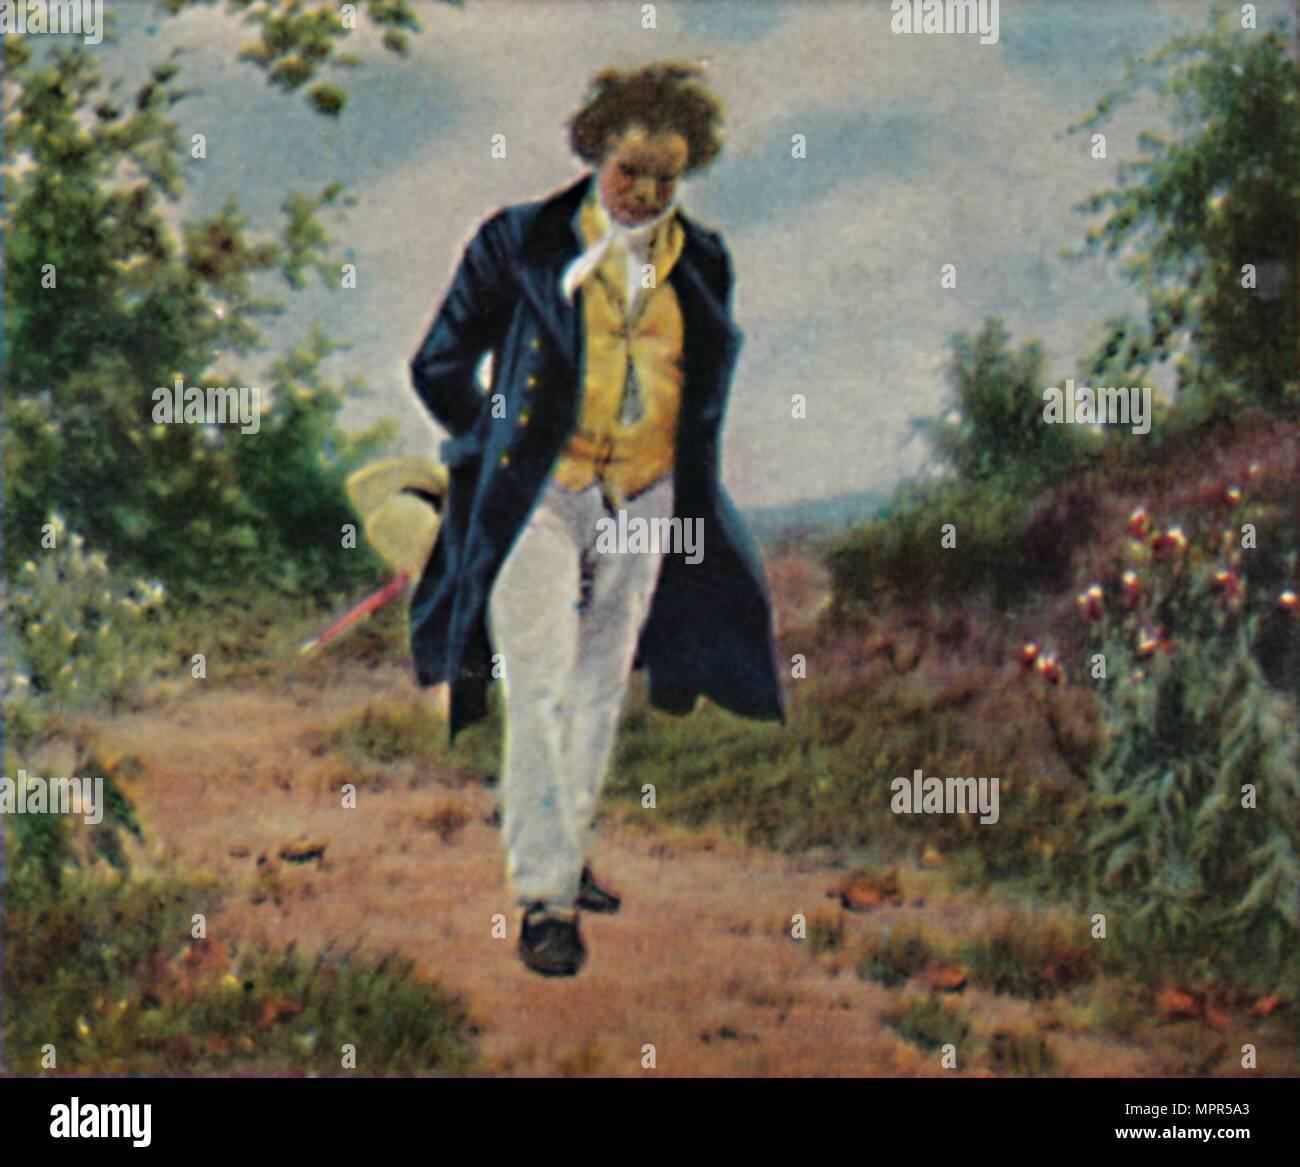 'Ludwig van Beethoven 1770-1827. - Gemälde von Schmid', 1934. Artist: Unknown. - Stock Image